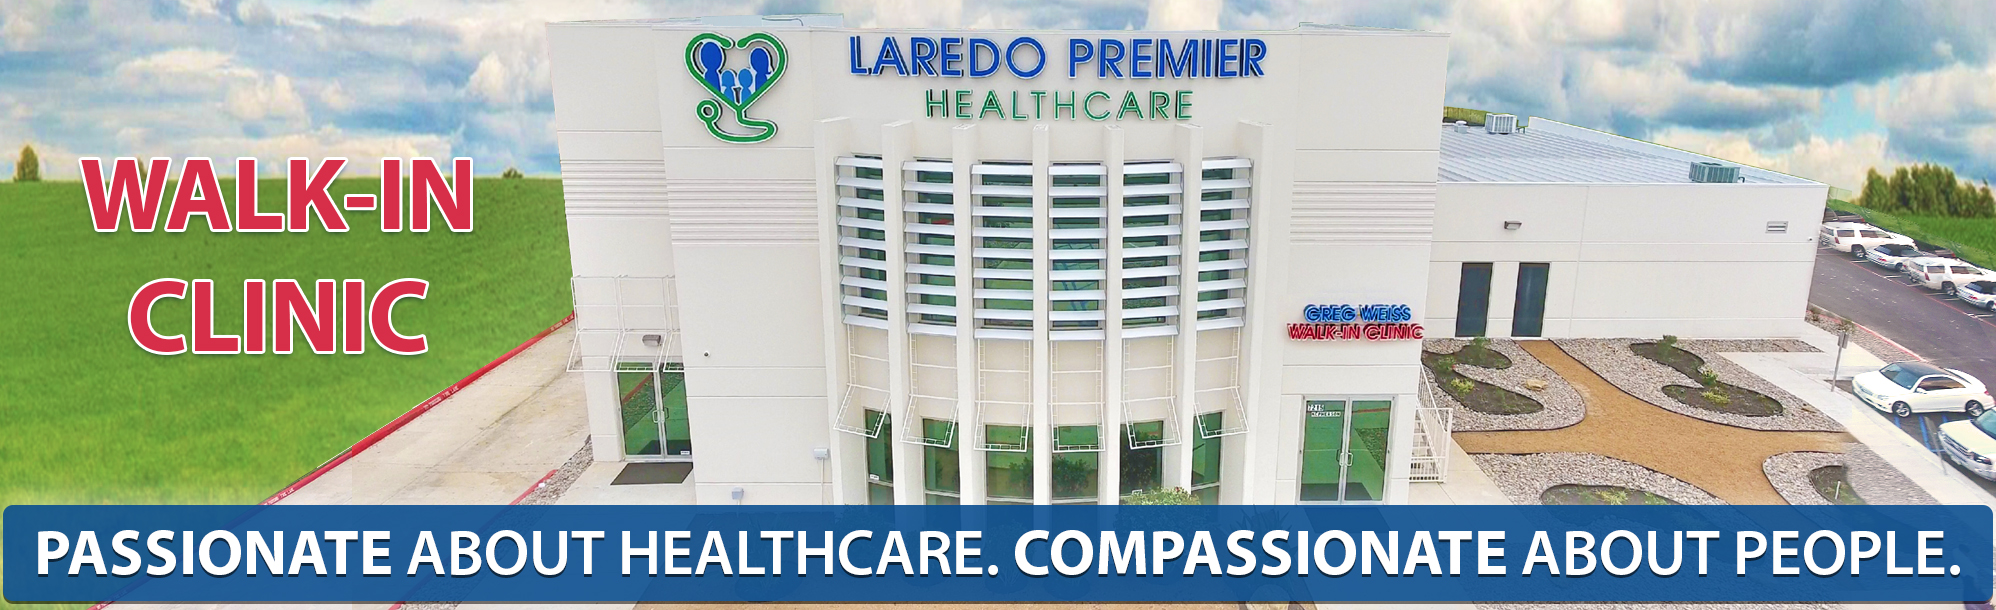 Laredo Premier Home Banner Laredo Texas Walk in Clinic.jpg